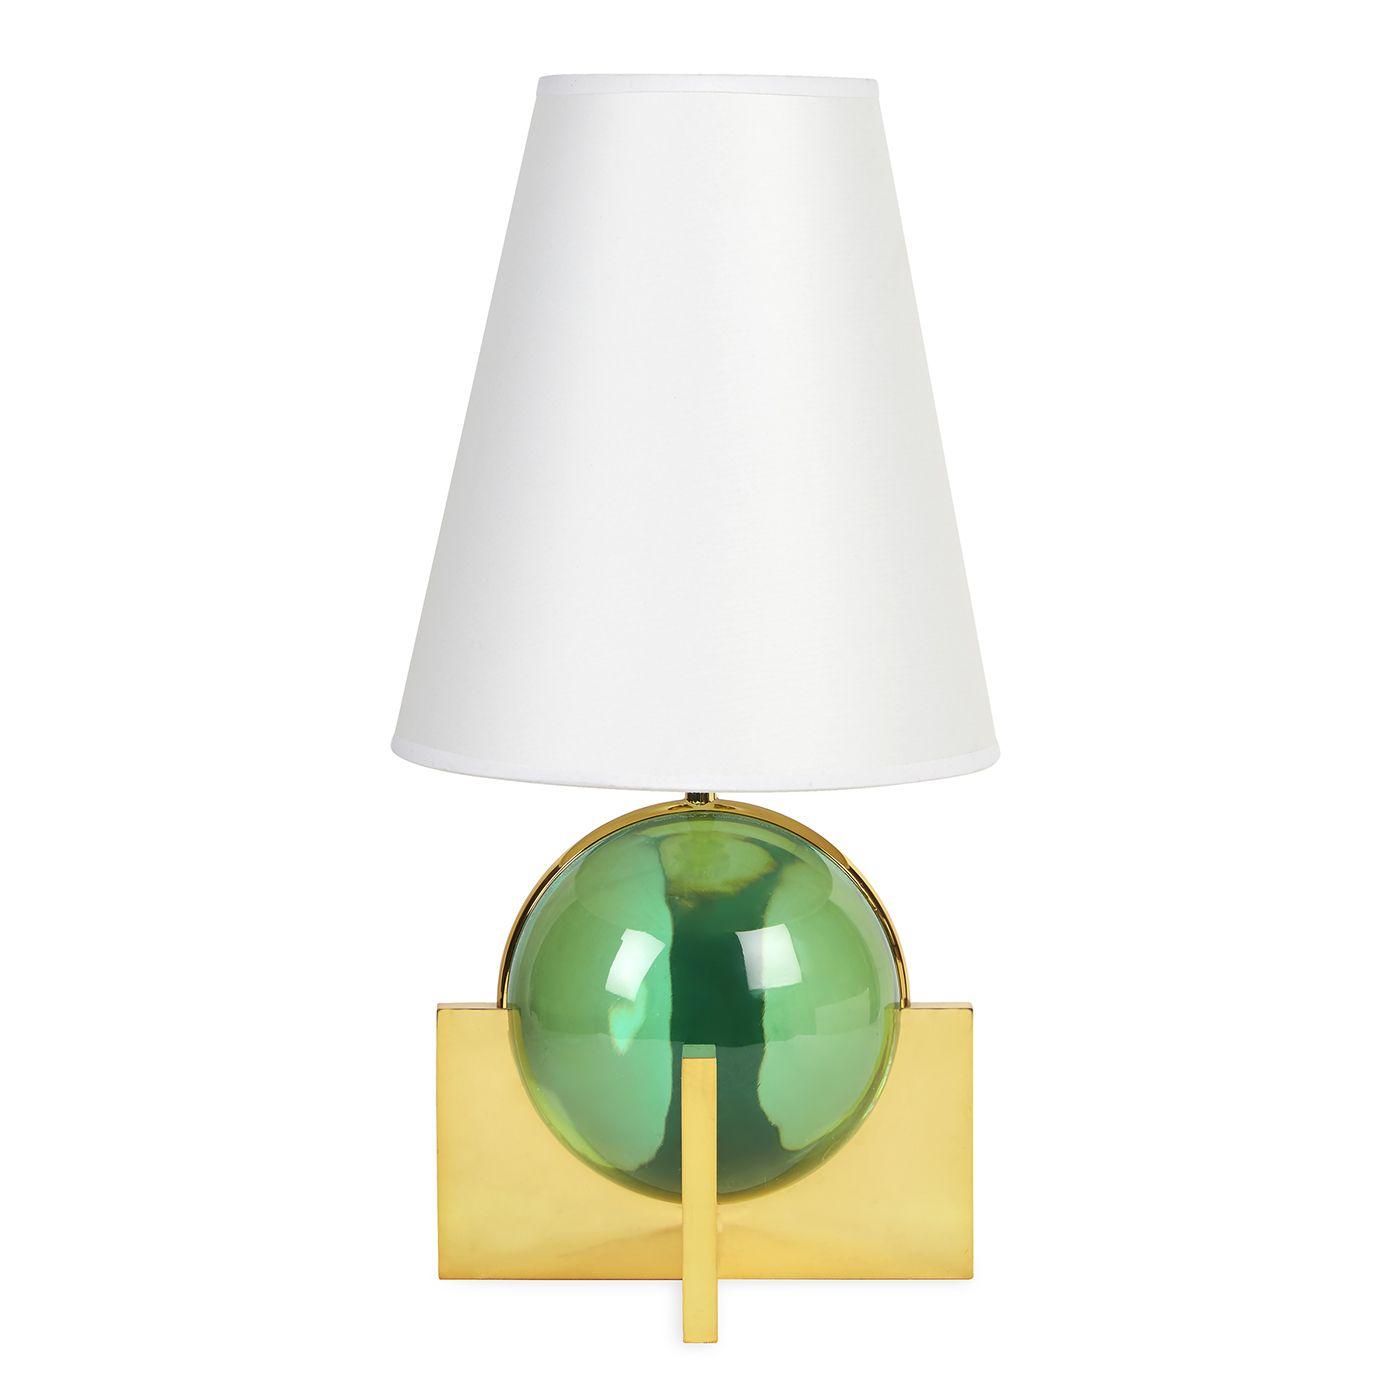 Globo Vanity Lamp Vanity Lamp Table Lamp Contemporary Table Lamps